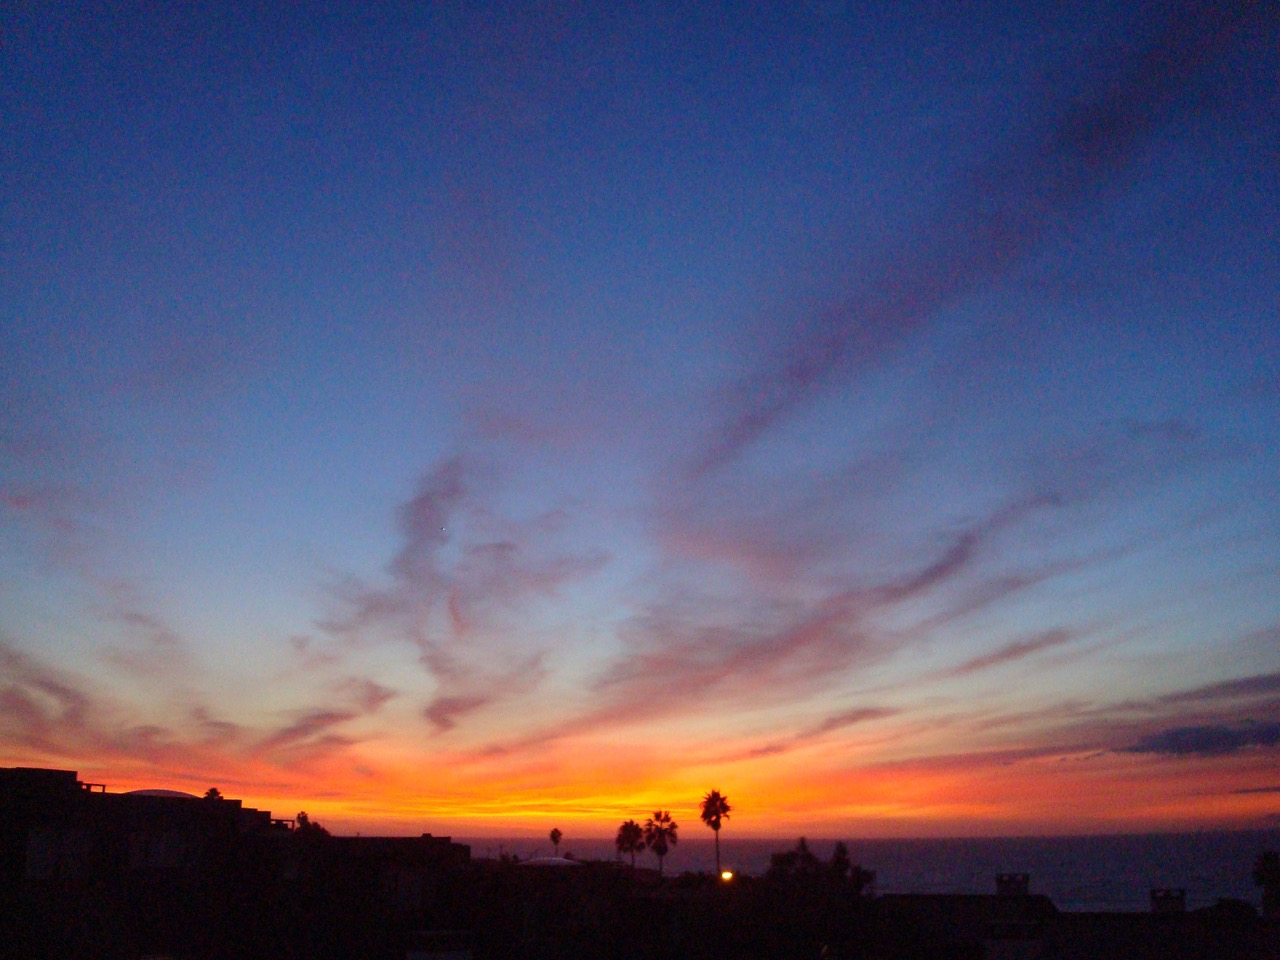 419-Camino-De-Las-Colinas-sunset-view2-from-Linda